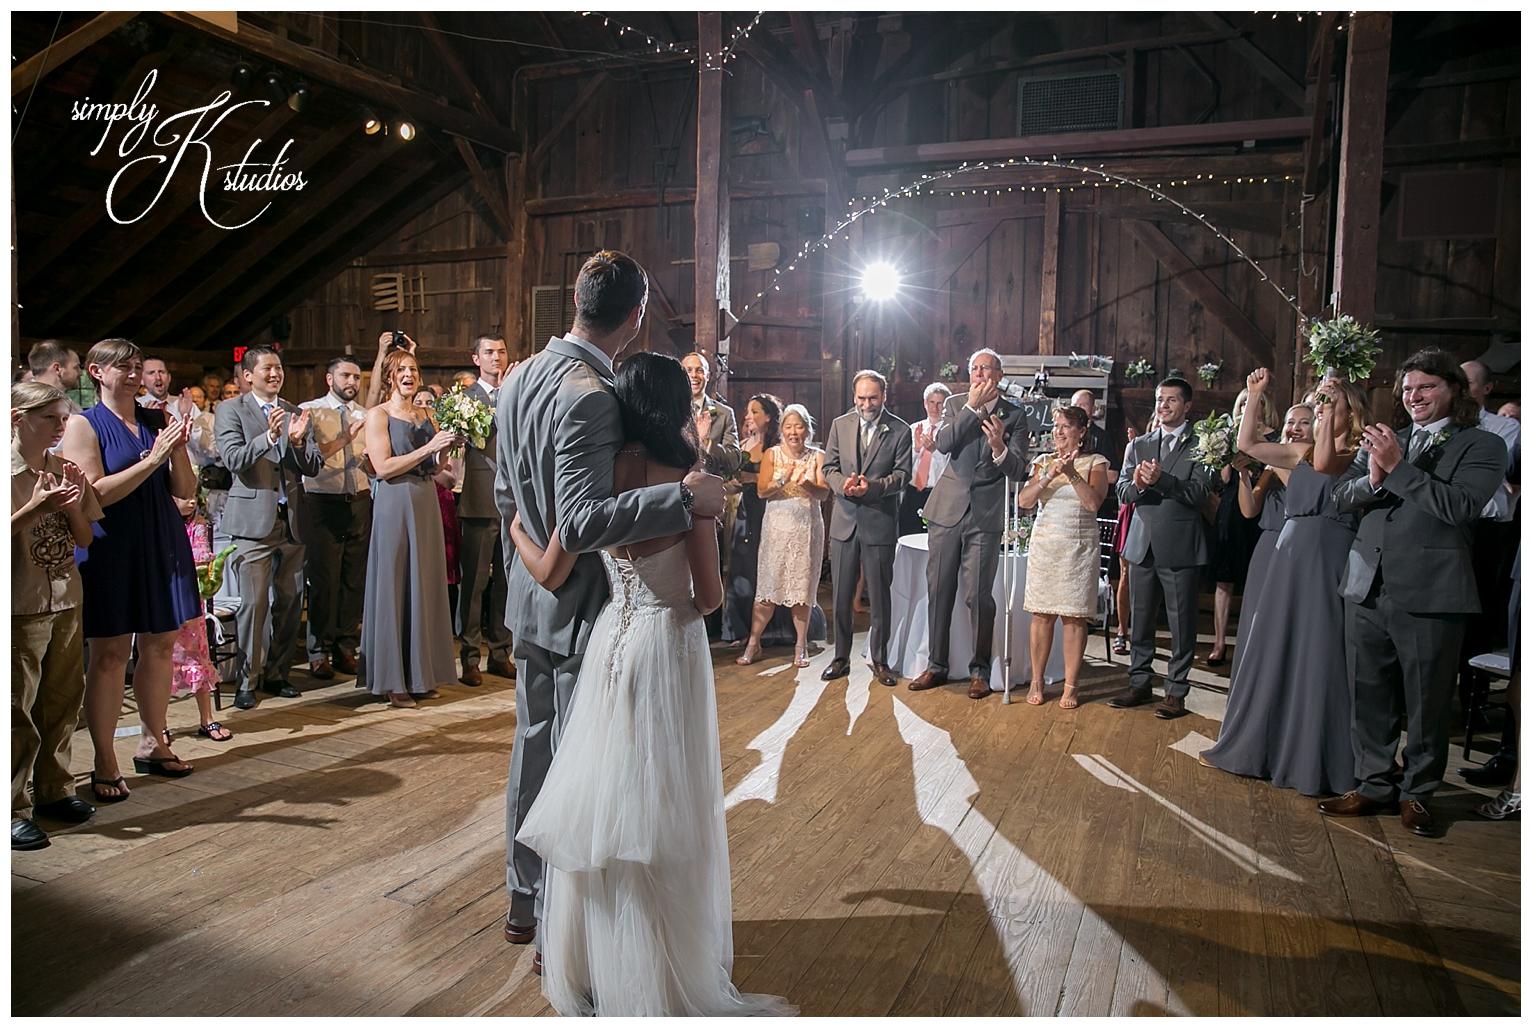 Wedding Entrances at Webb Barn.jpg